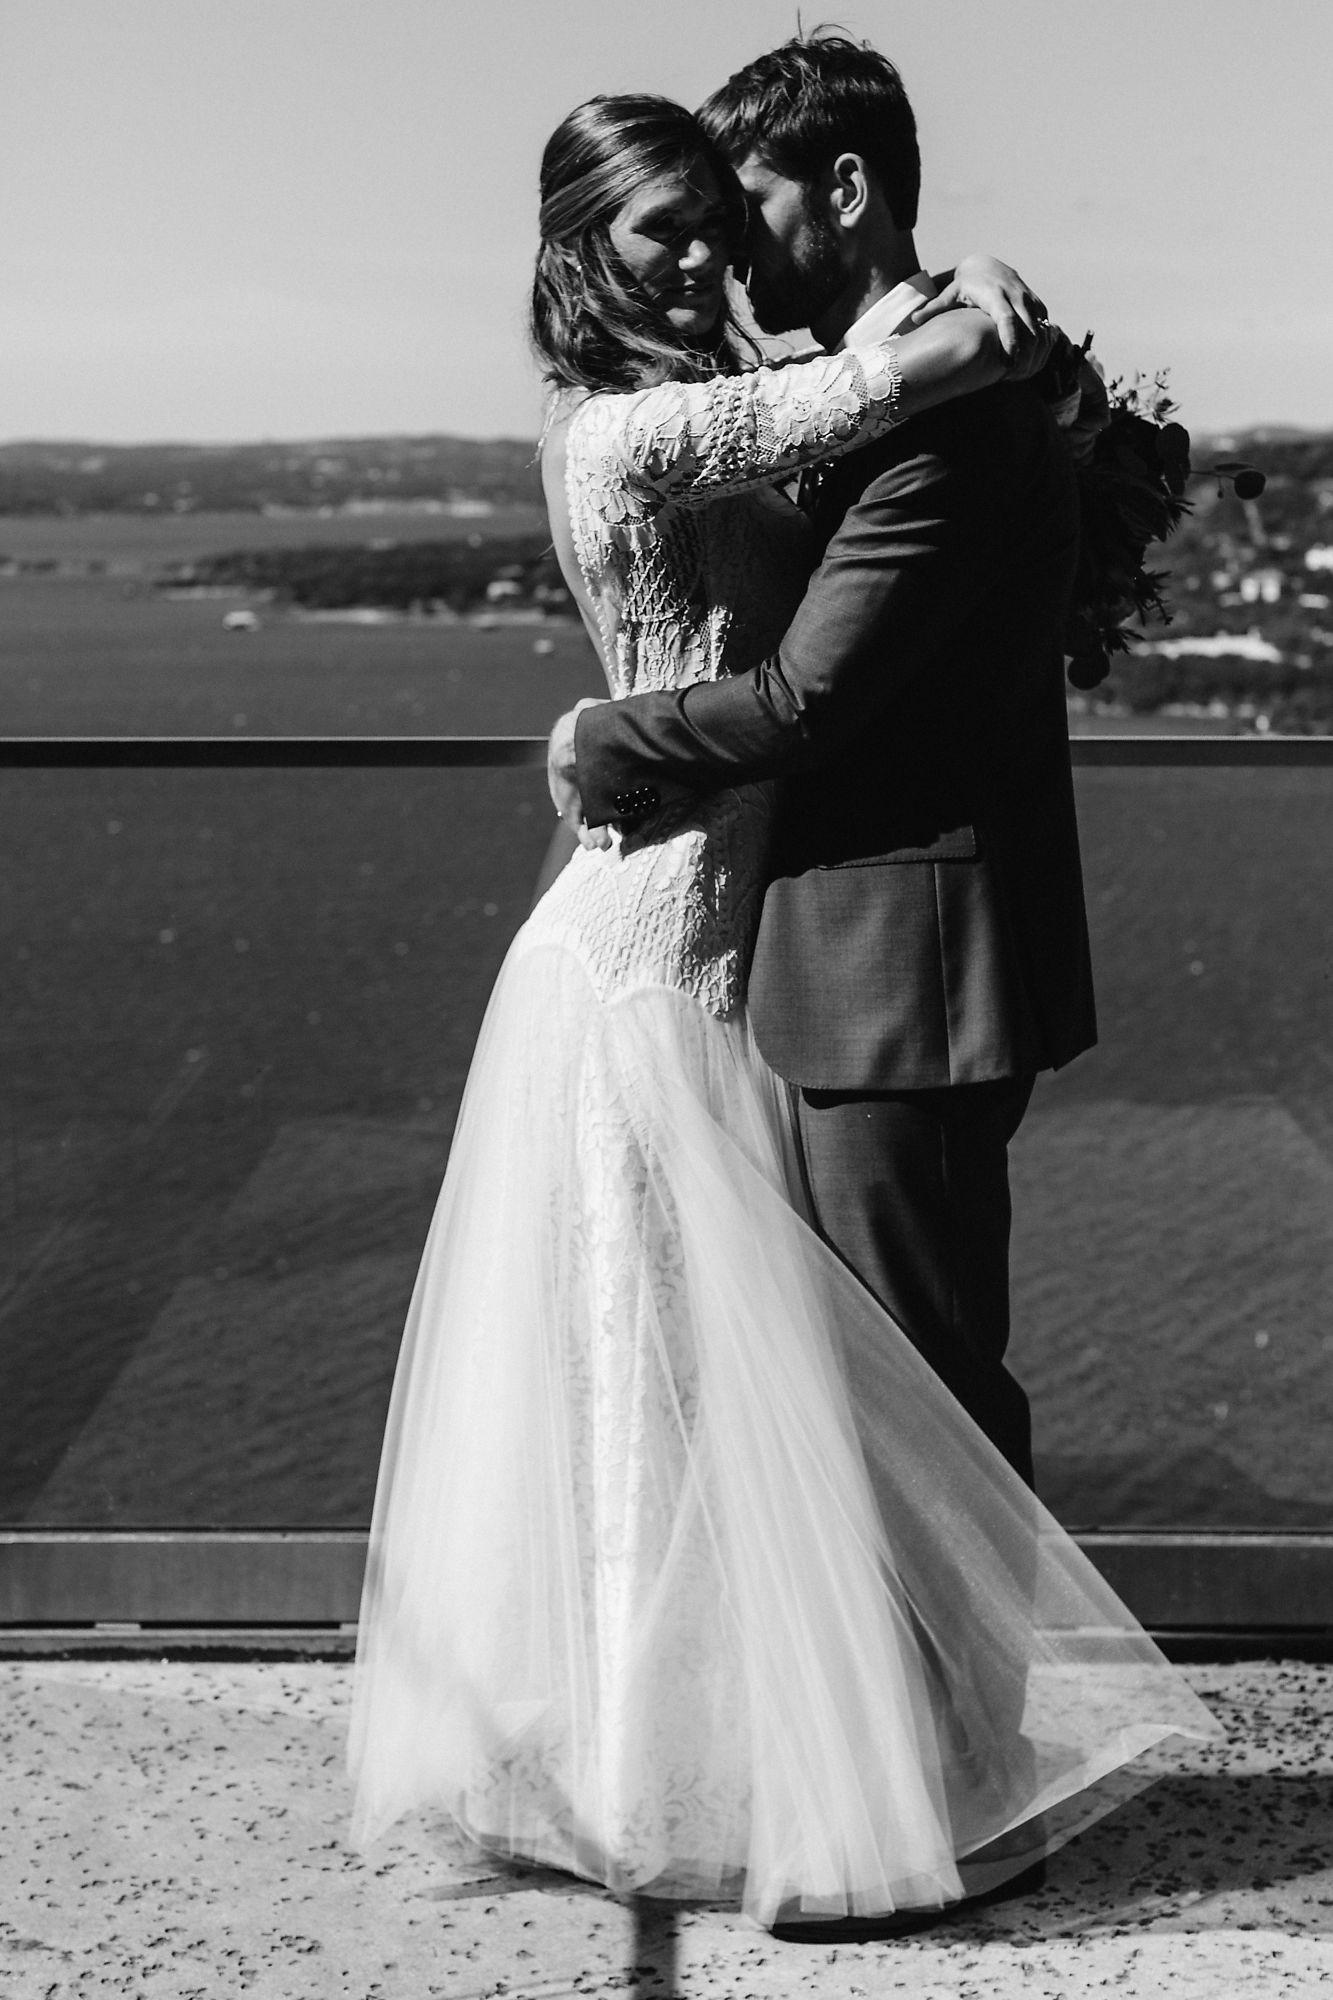 jessica_austin_oasis_brewery_wedding_photos134249.jpg